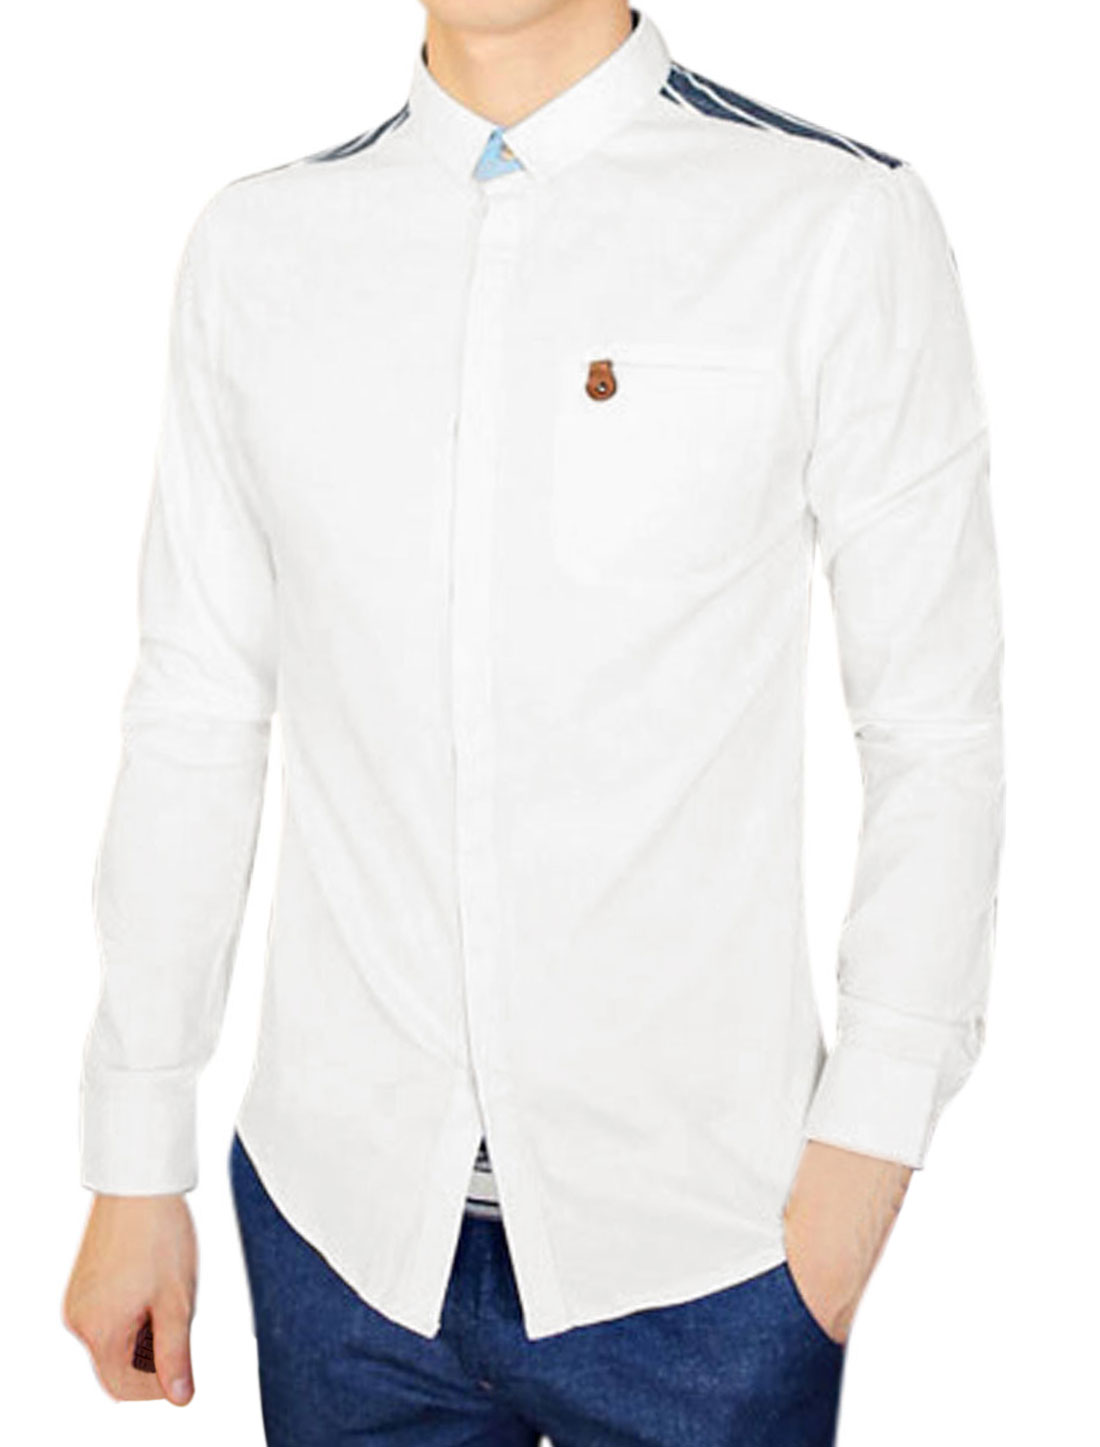 Men Long Sleeve Button Down Stripes Shirt Tops Navy Blues White M